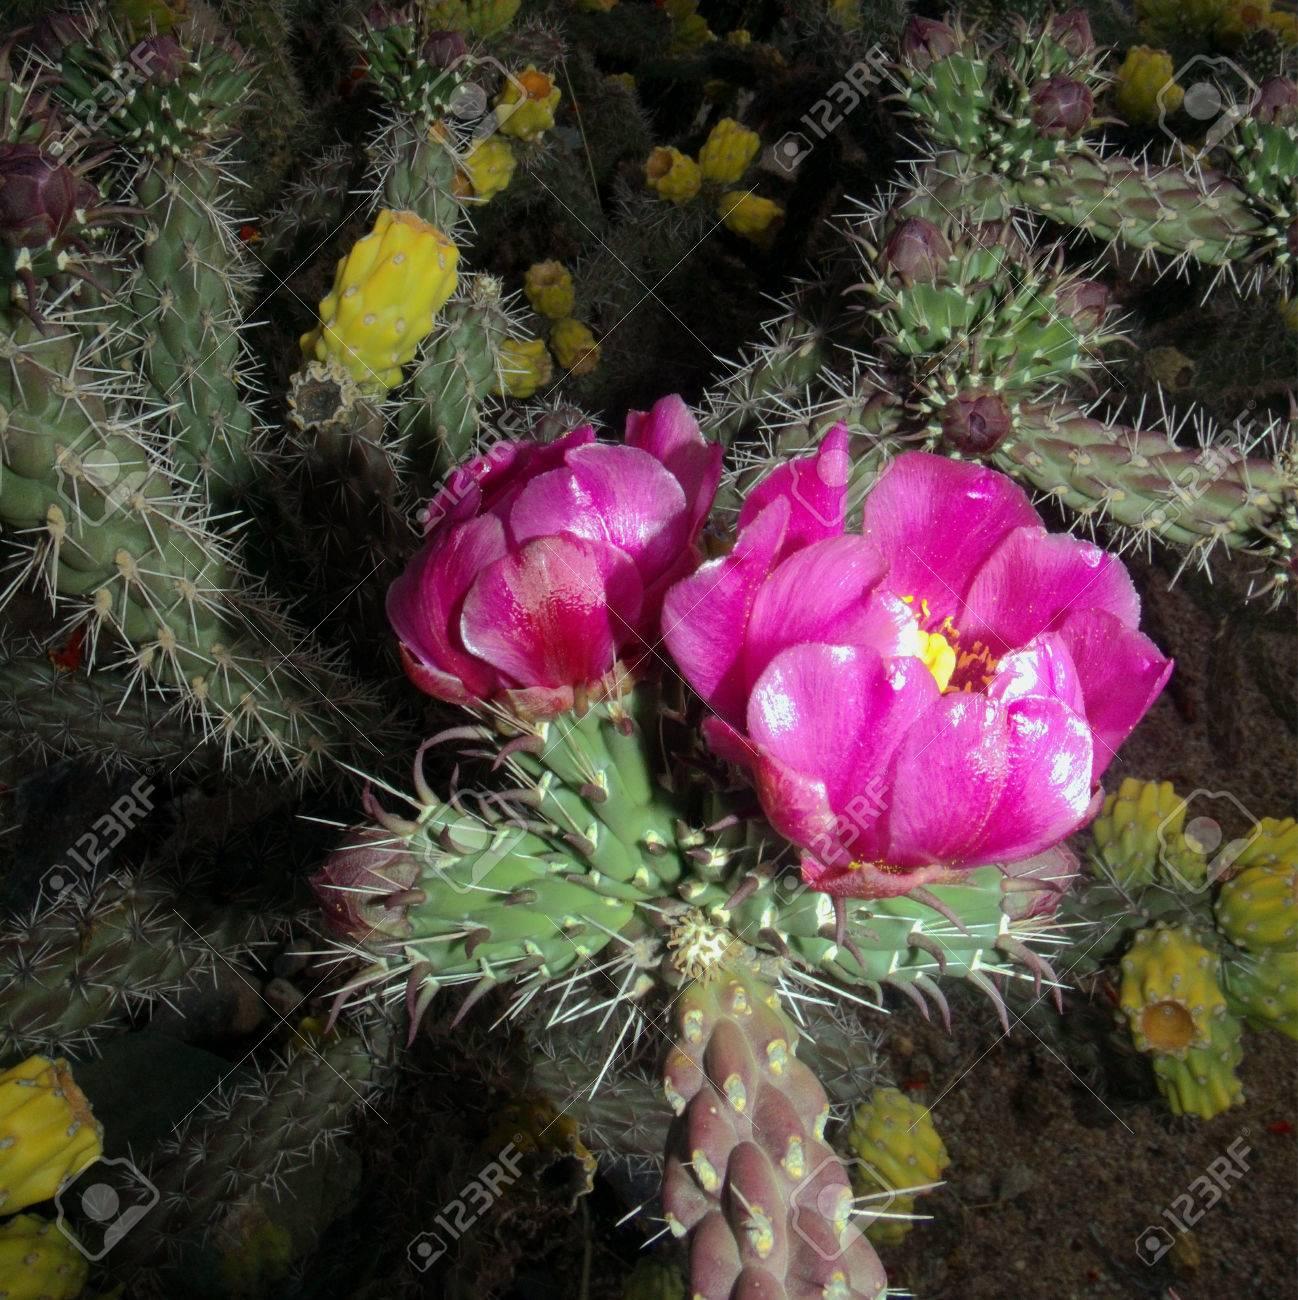 Arizona cochise county cochise - 78 Canechollalowers Cochise County Arizona Usa Cane Cholla Cactus Cylindropuntia Imbricata Magenta Pink Flower